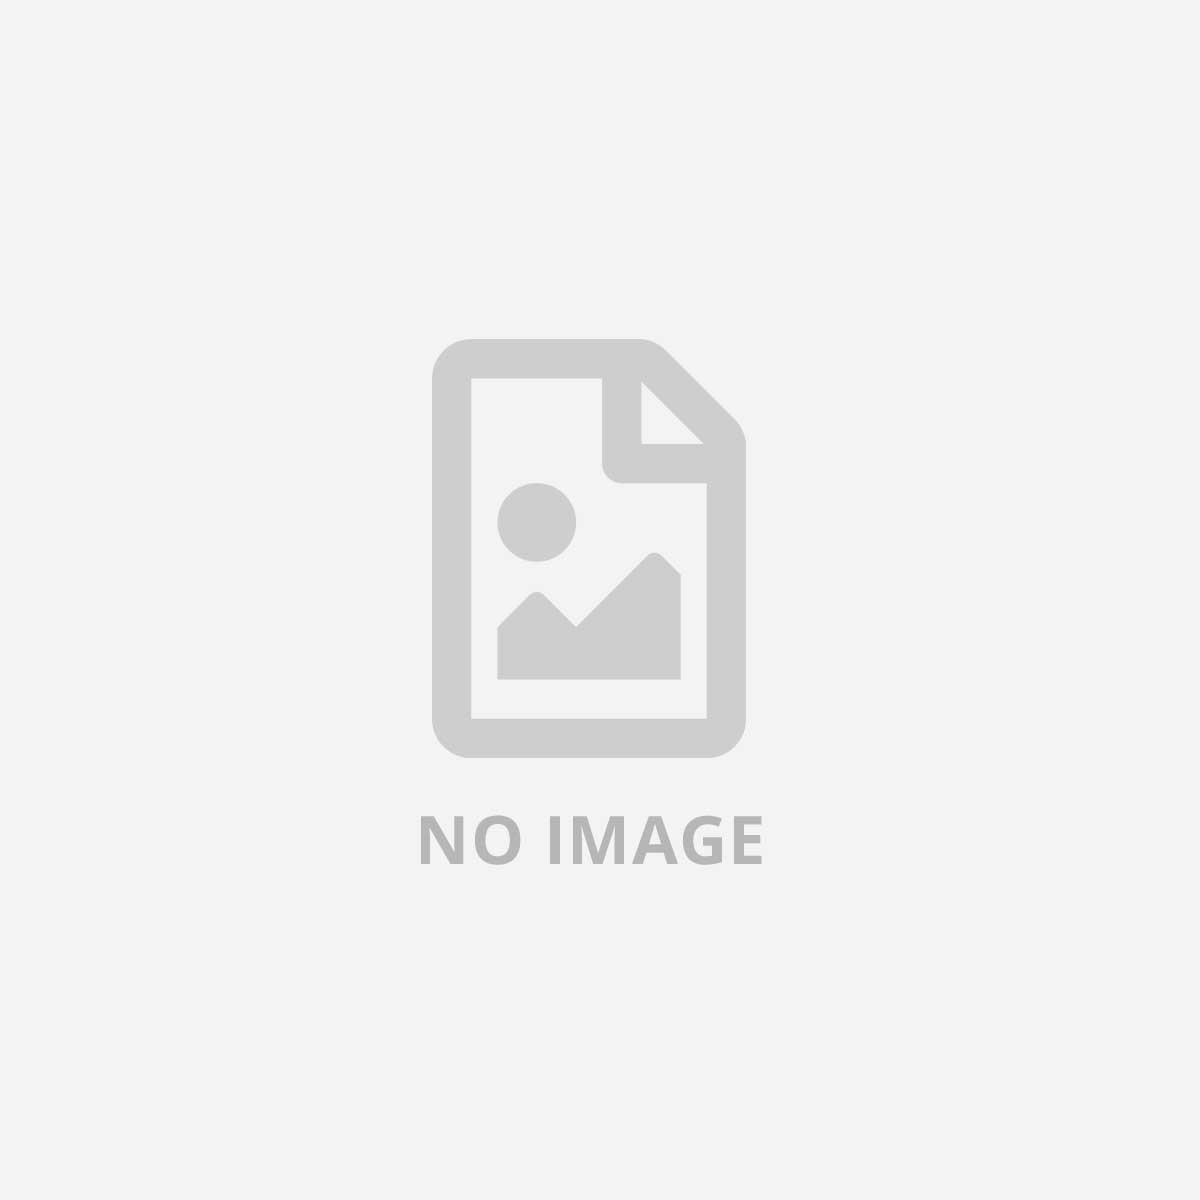 SONY DSC W830 20MP BLACK